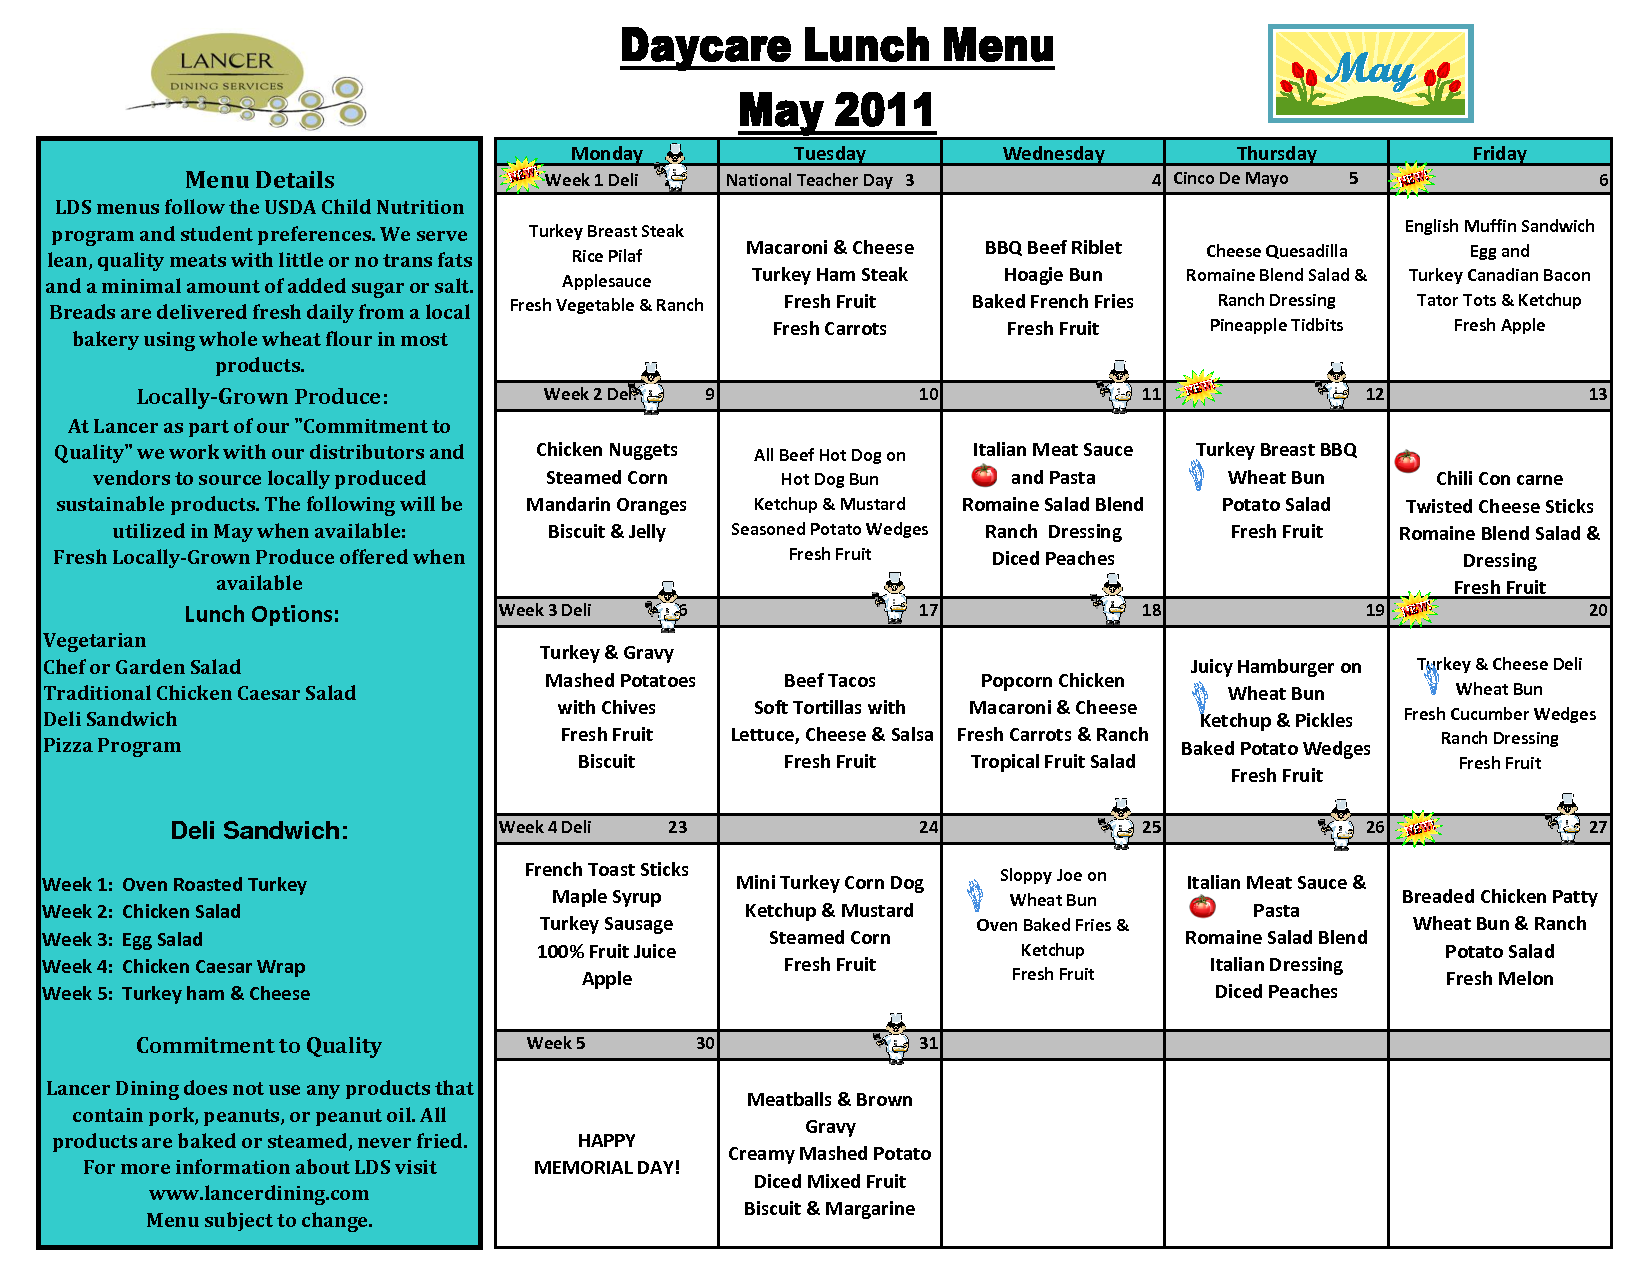 Daycare Lunch Menu Template